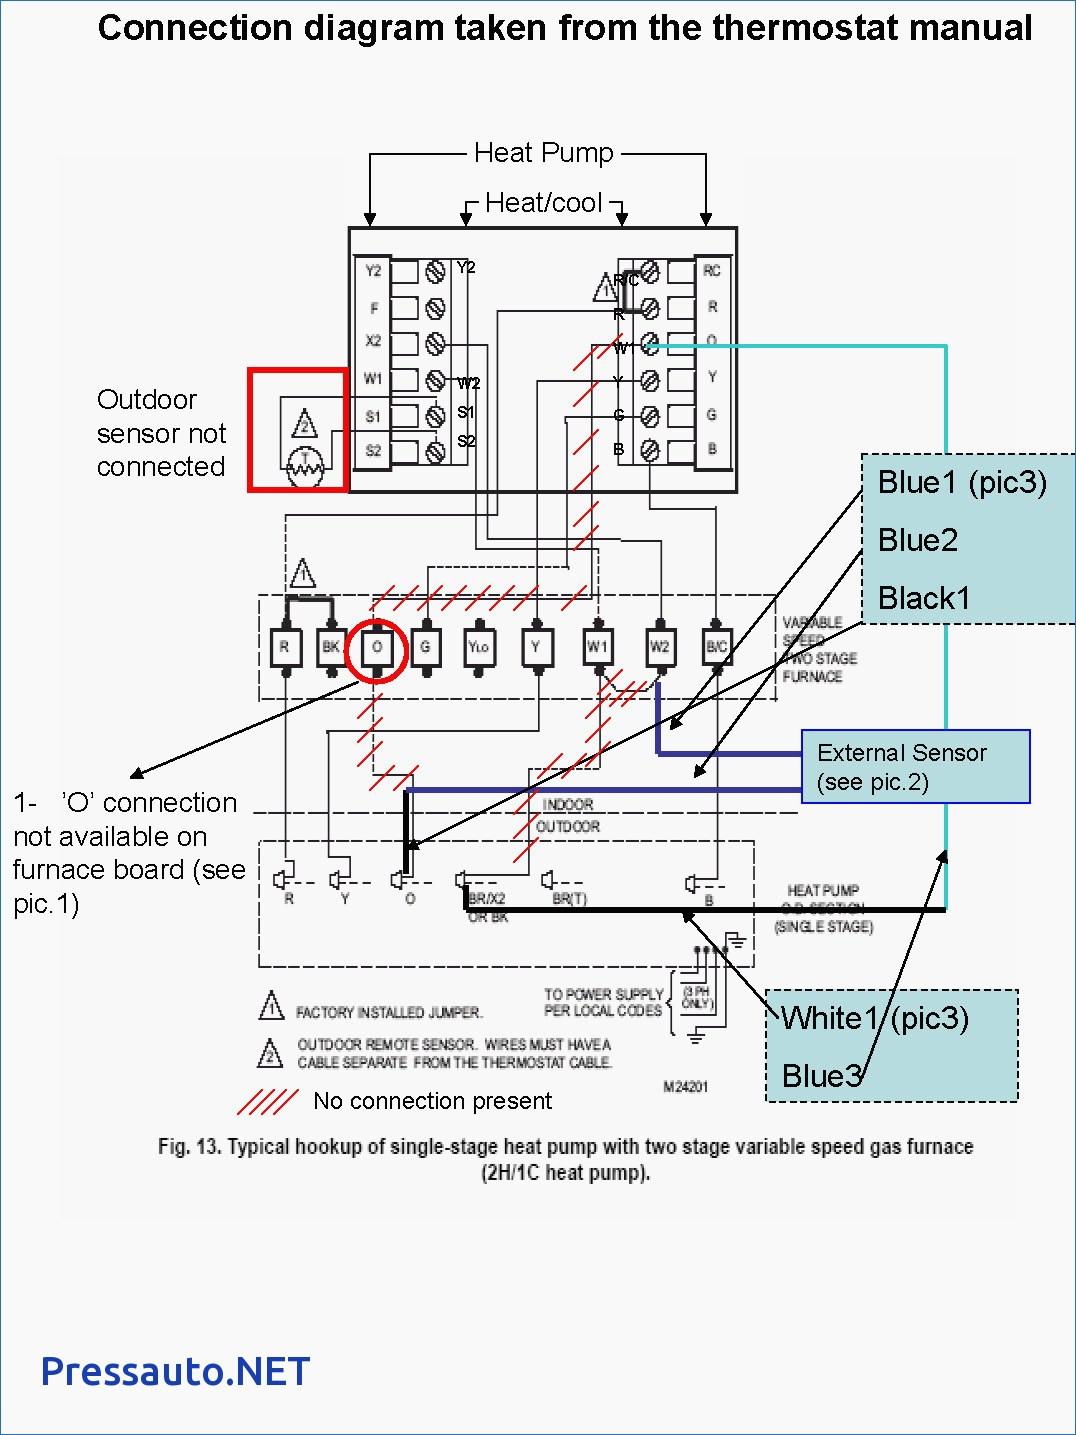 lennox air conditioner wiring diagram lennox air conditioner wiring diagram free download lupa main  lennox air conditioner wiring diagram